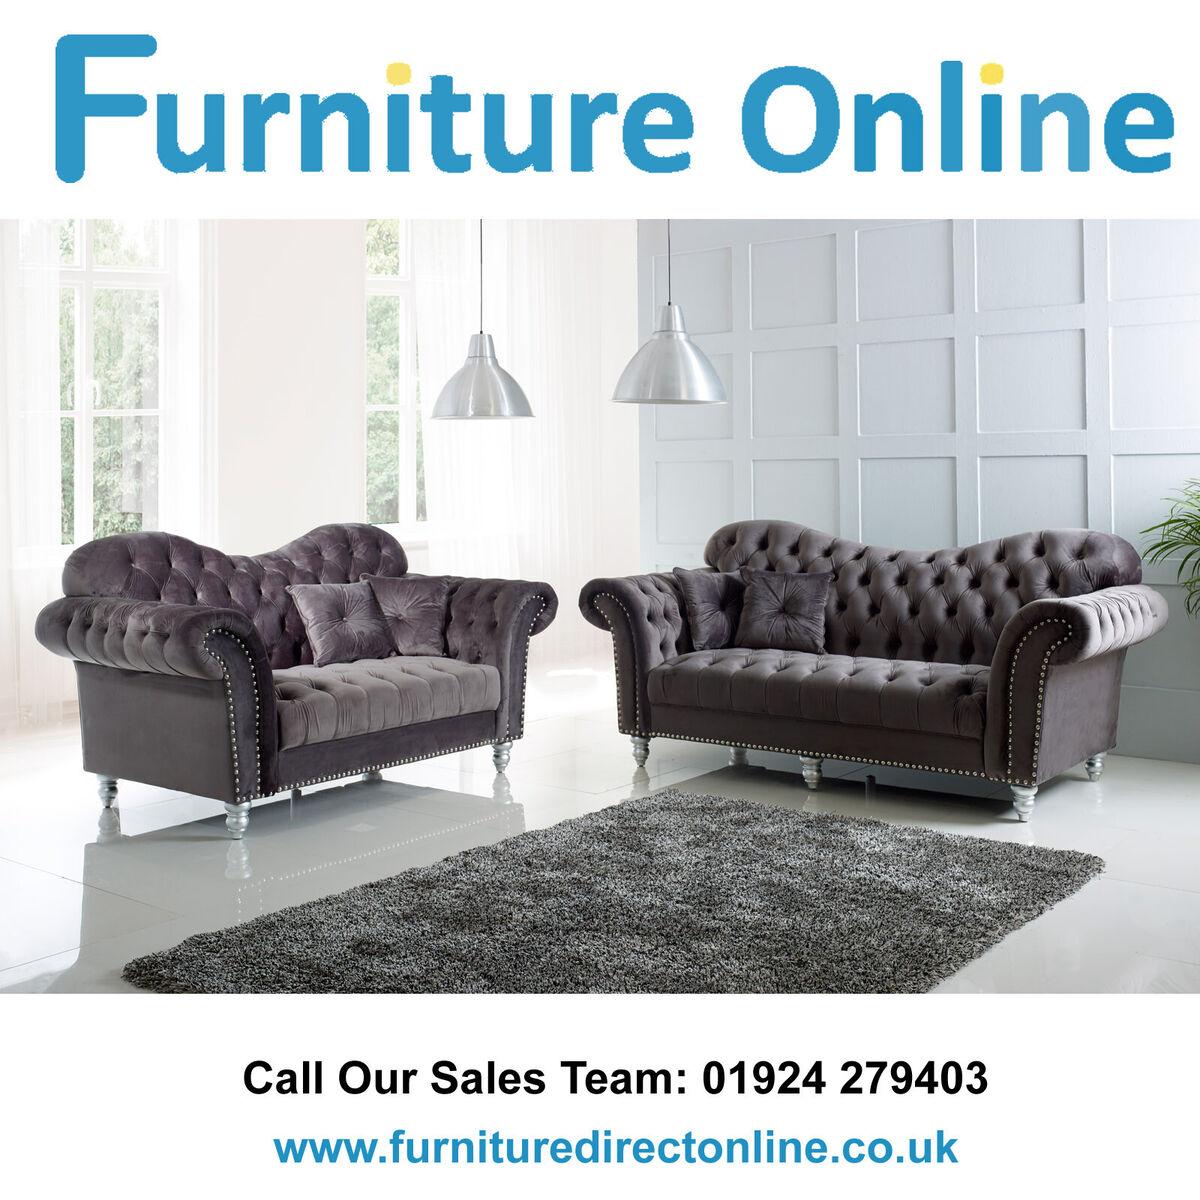 furnituredirectonline